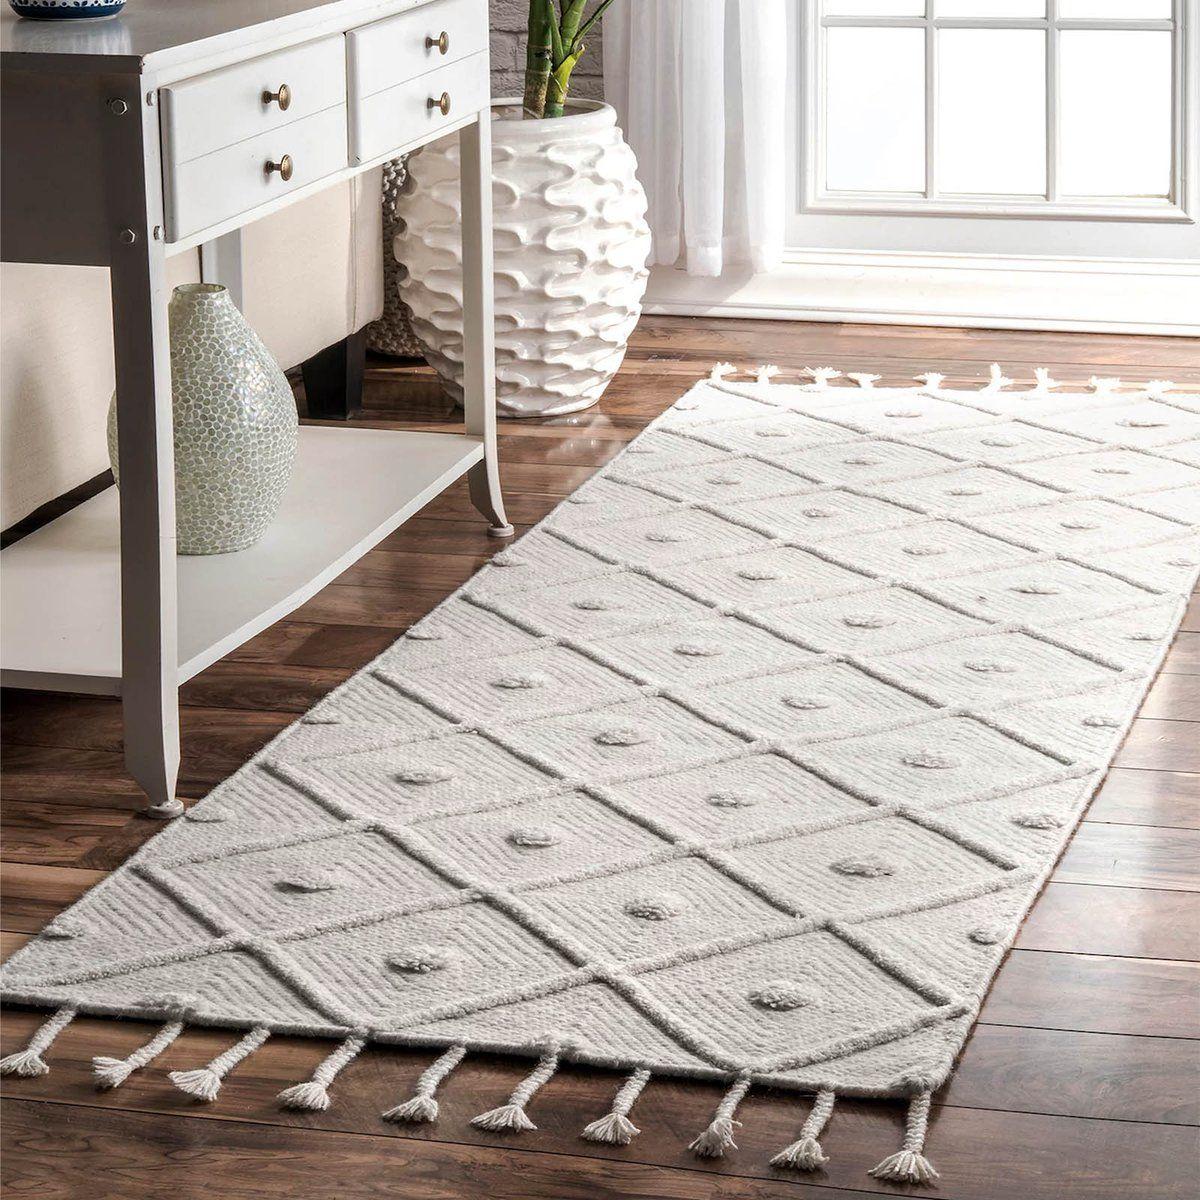 90x300 Cm Amak Handmade Wool Rug Amaka001 Long Handmade Wool